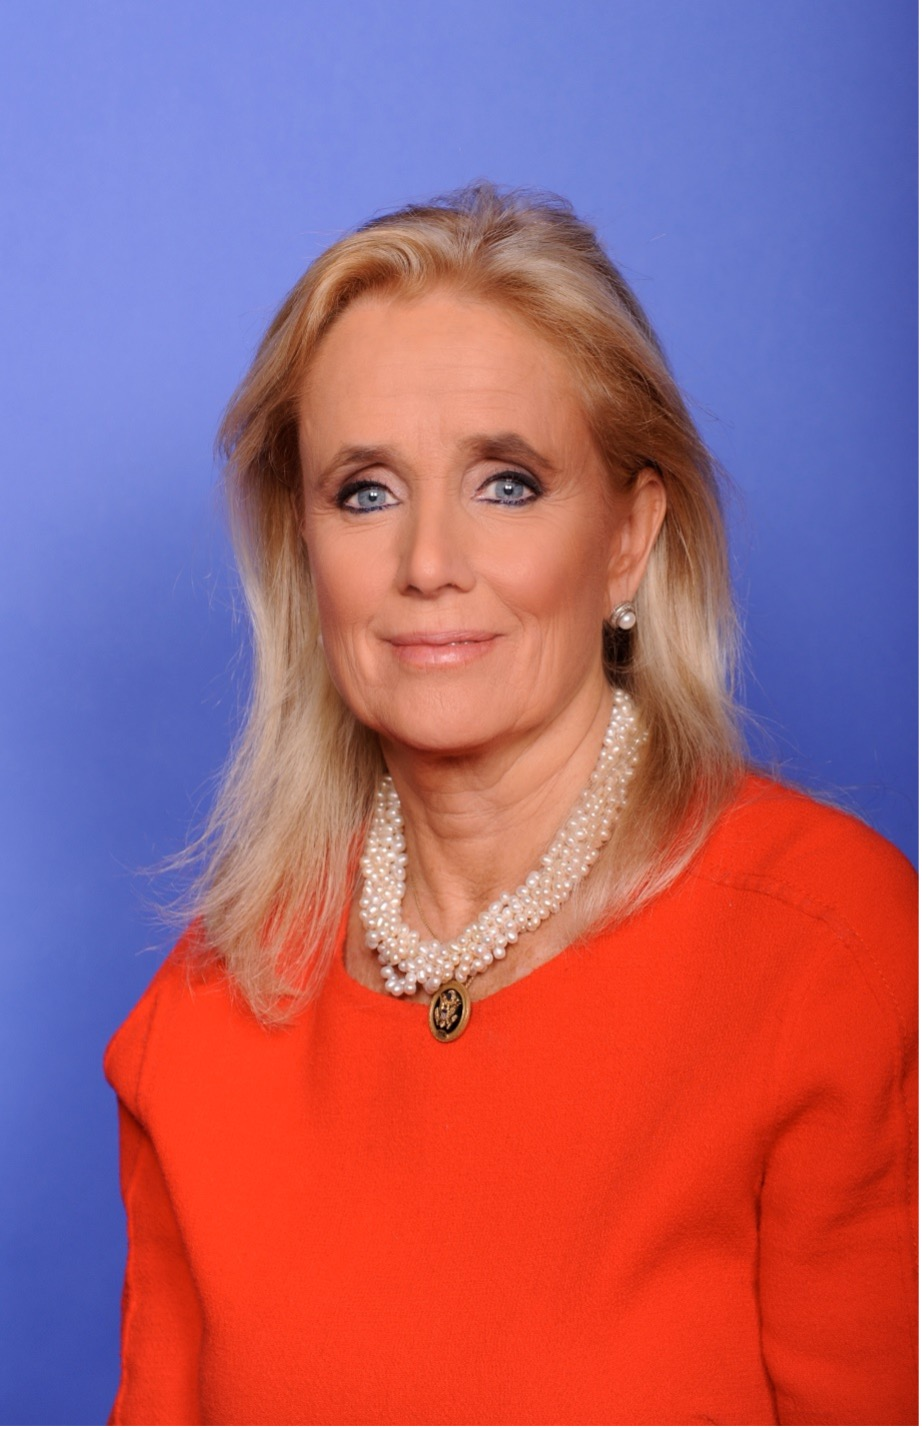 Representative Debbie Dingell (MI-12)